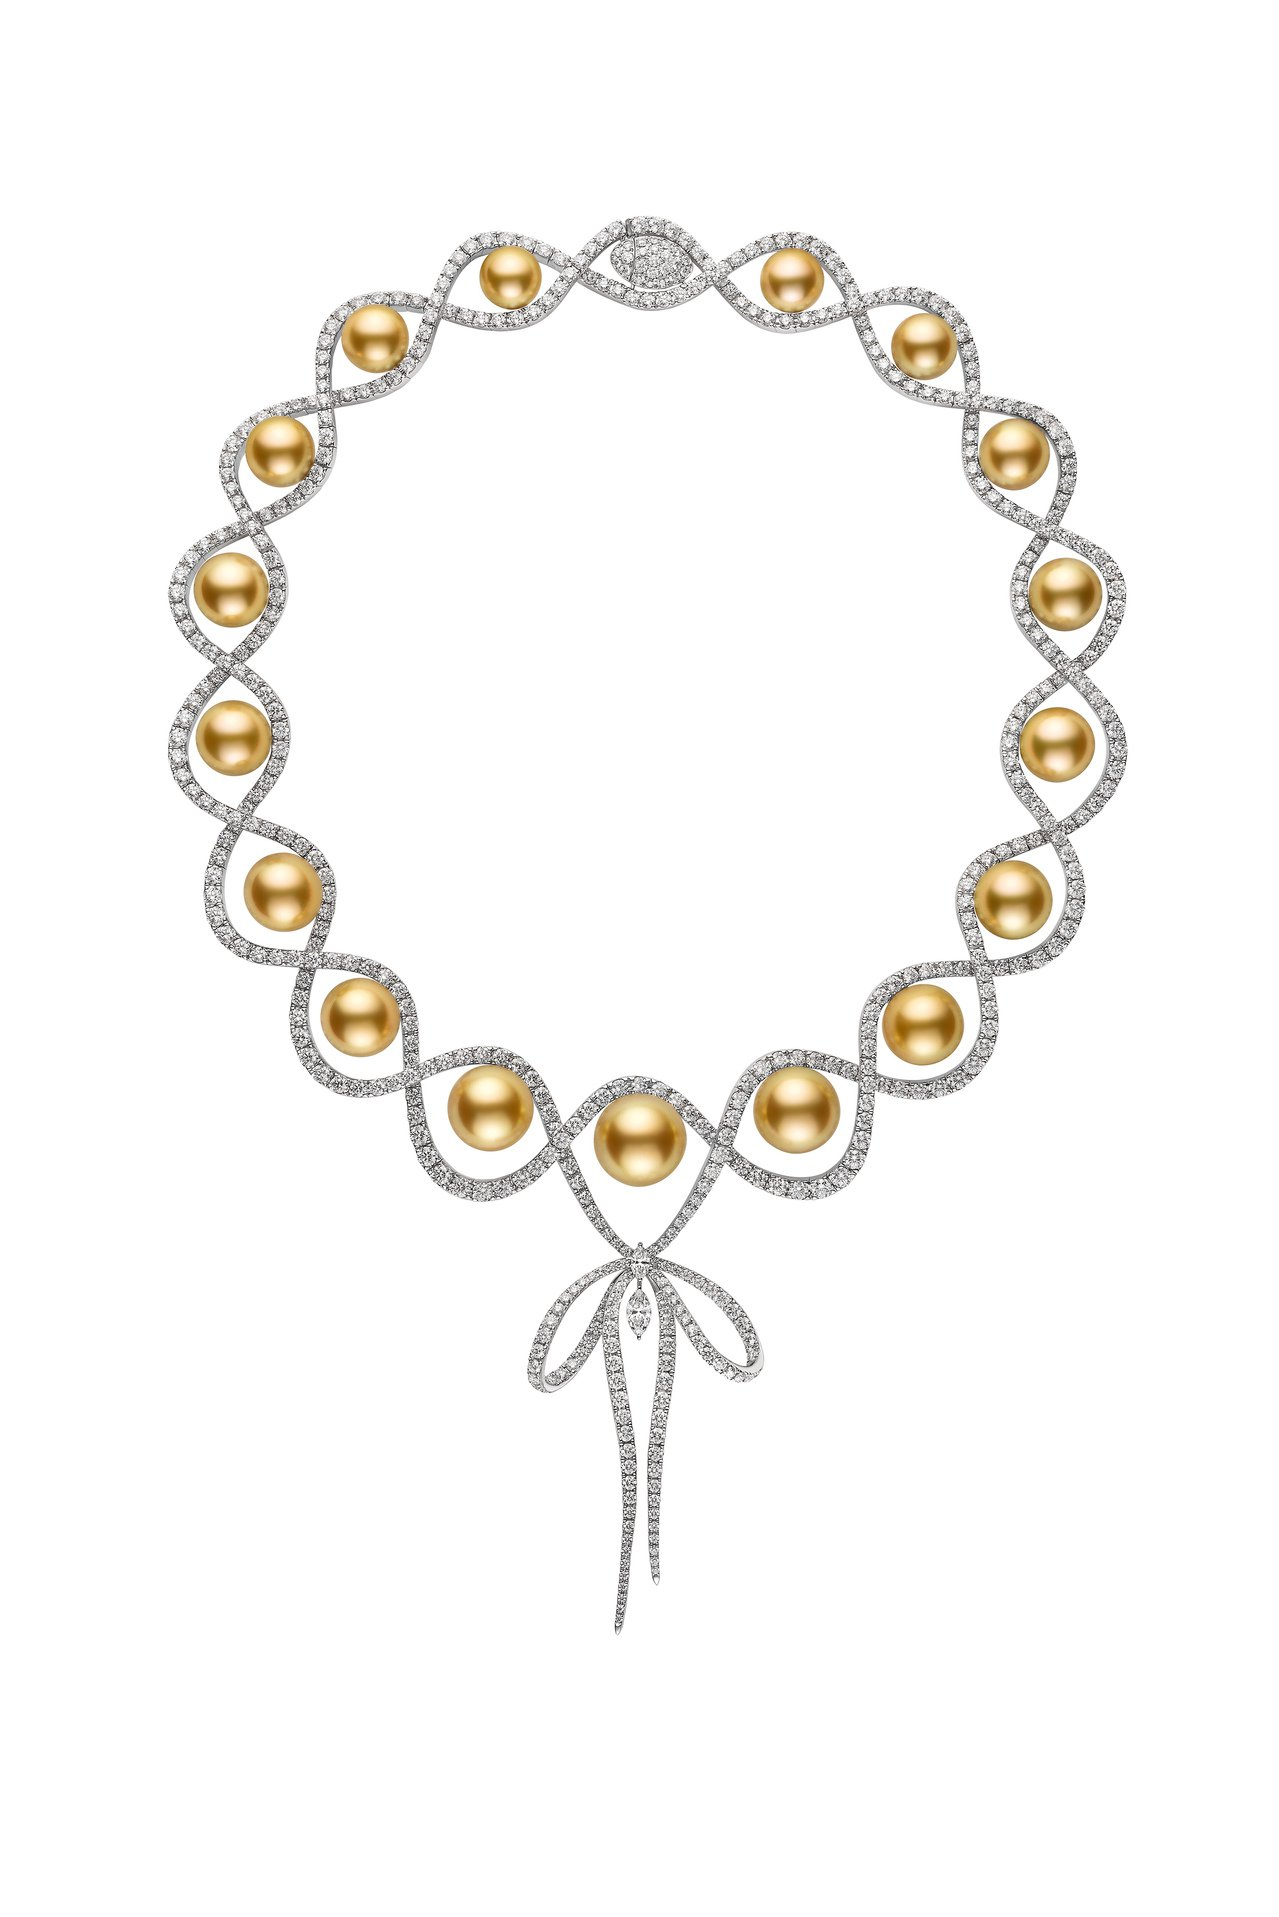 MIKIMOTO Jeux de Rubans 頂級珠寶系列,南洋黃金珍珠鑽石蝴...